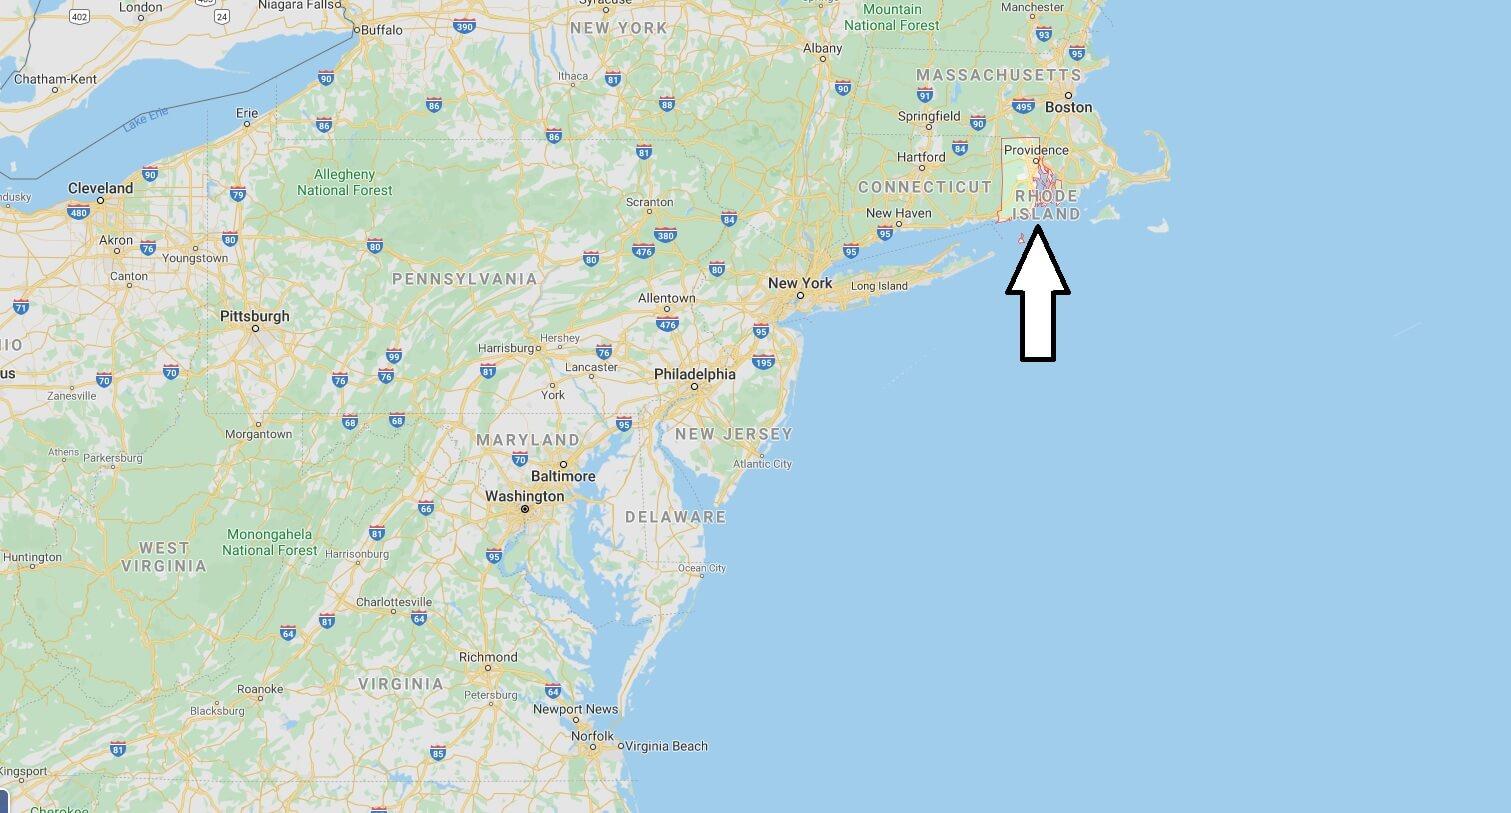 Rhode Island Nerede, Hangi Ülkede